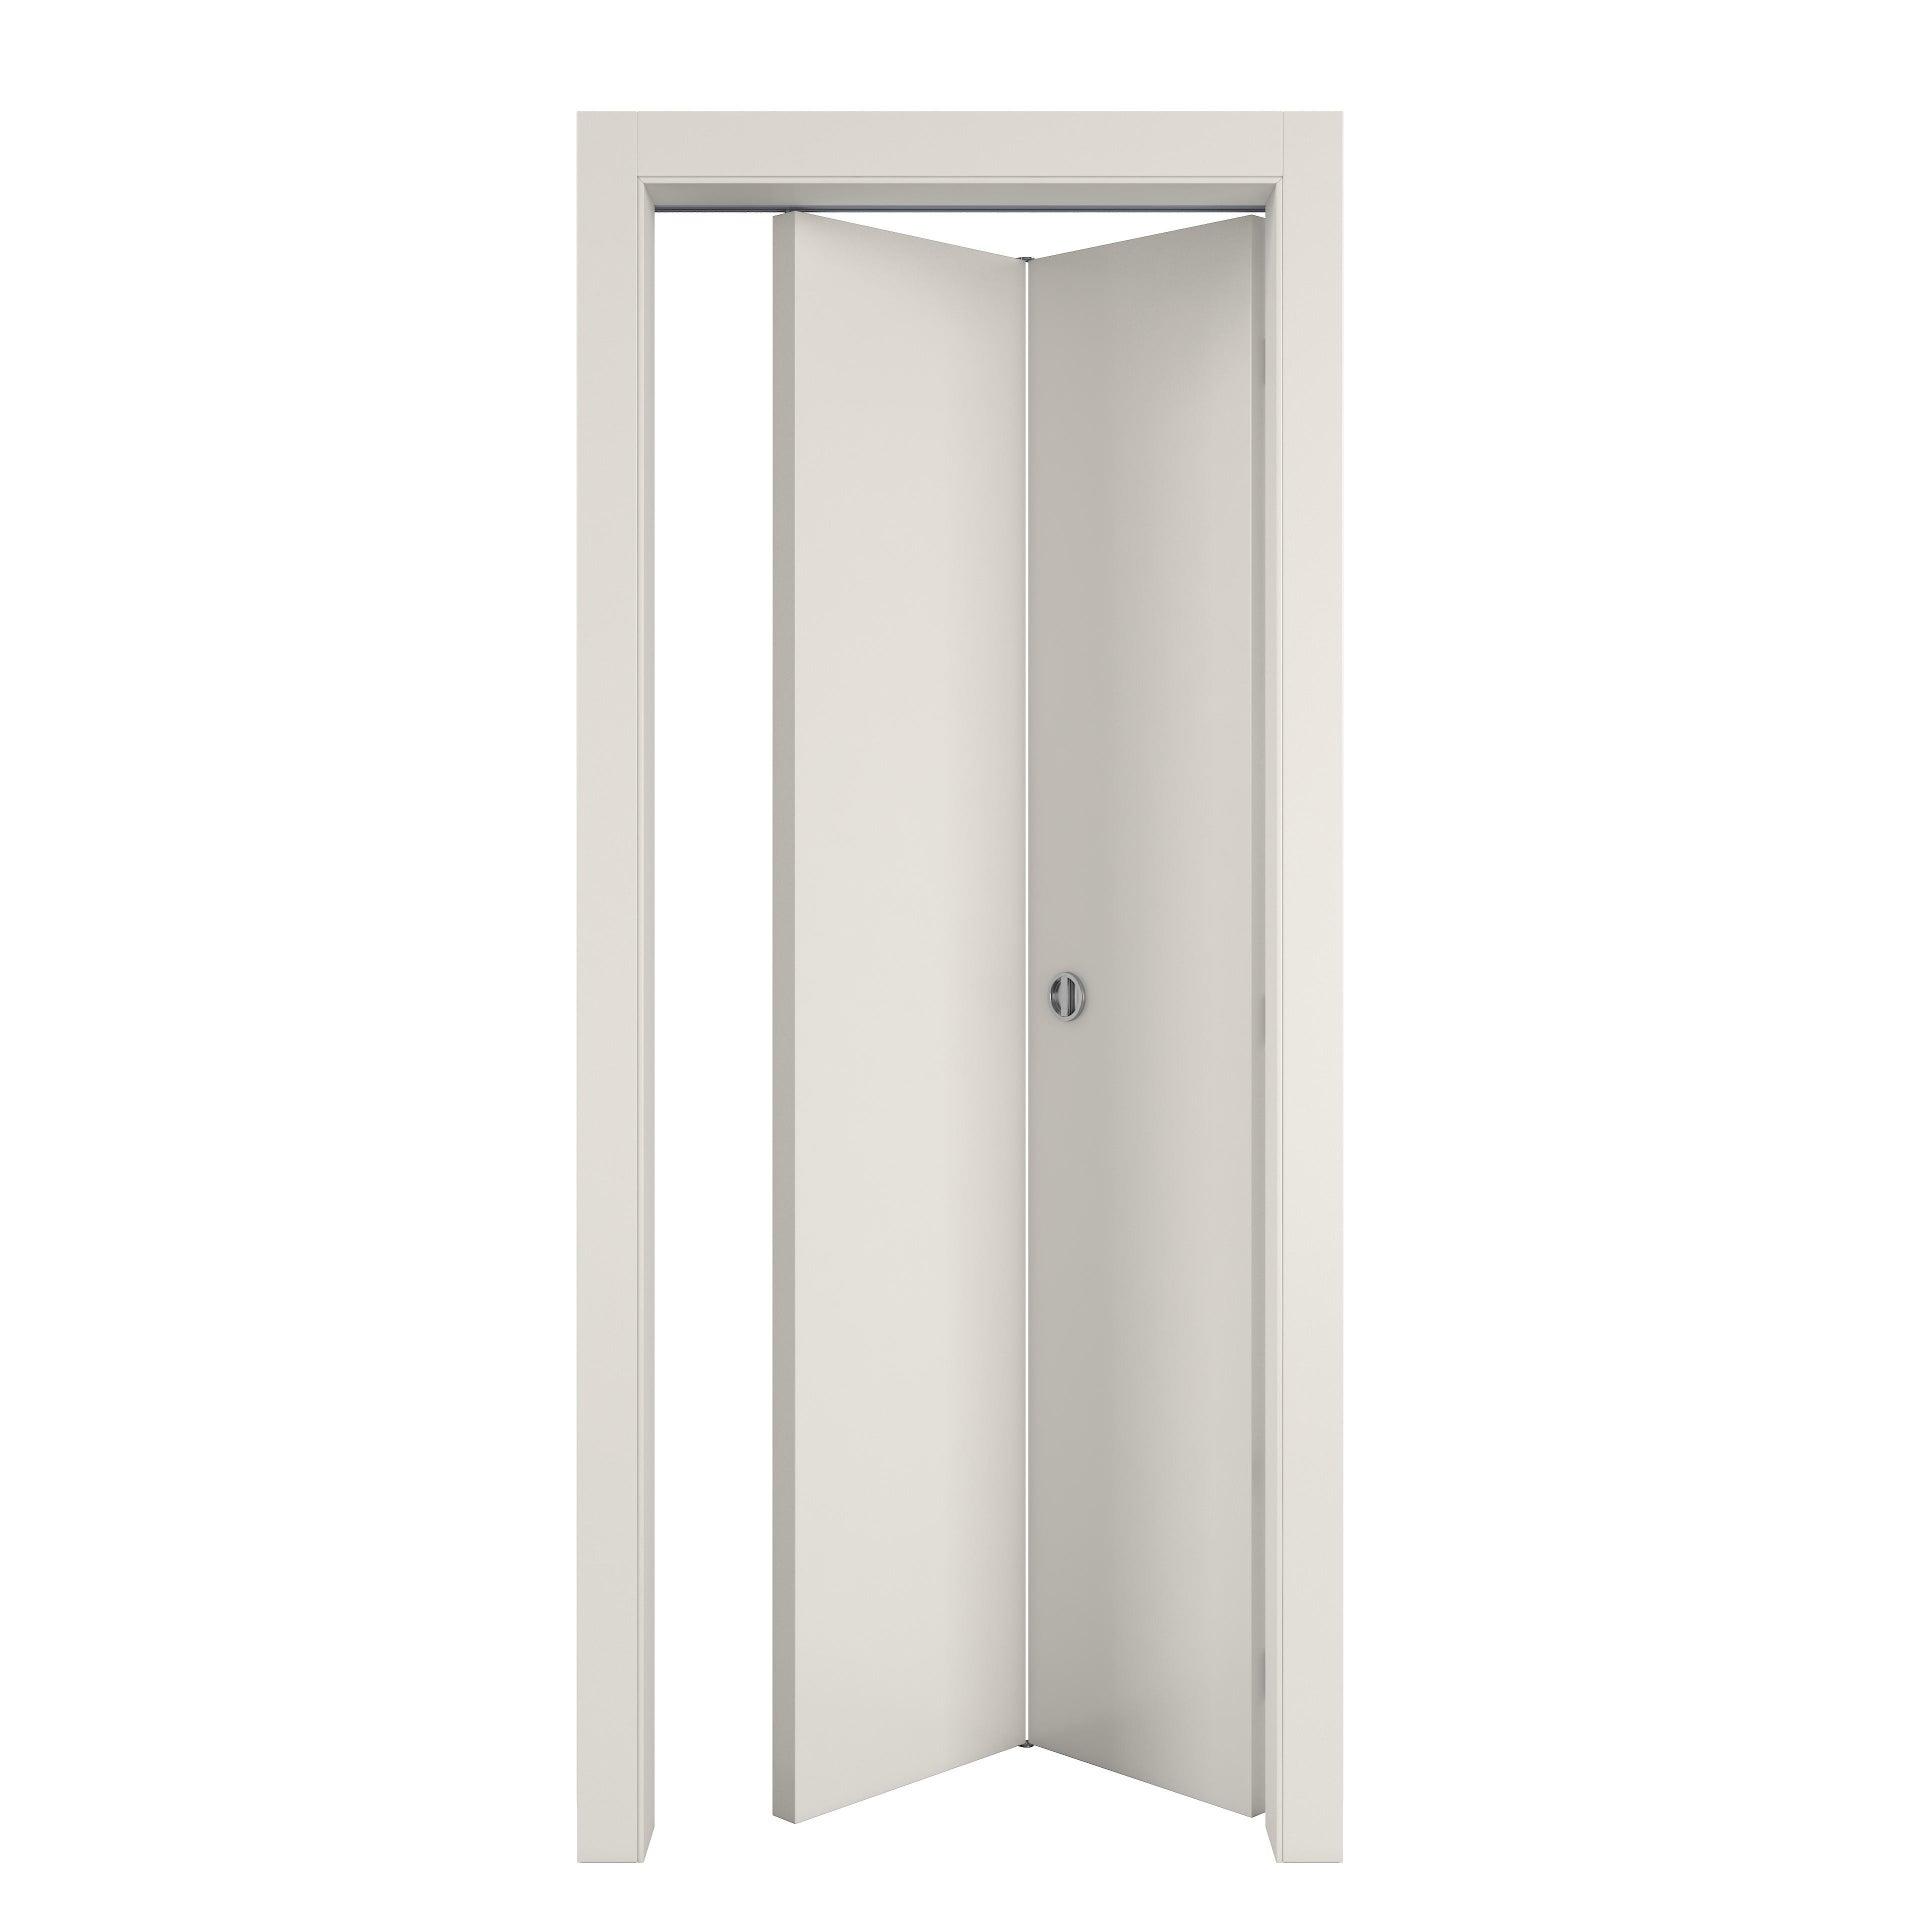 Porta pieghevole Strauss bianco L 80 x H 210 cm reversibile - 6